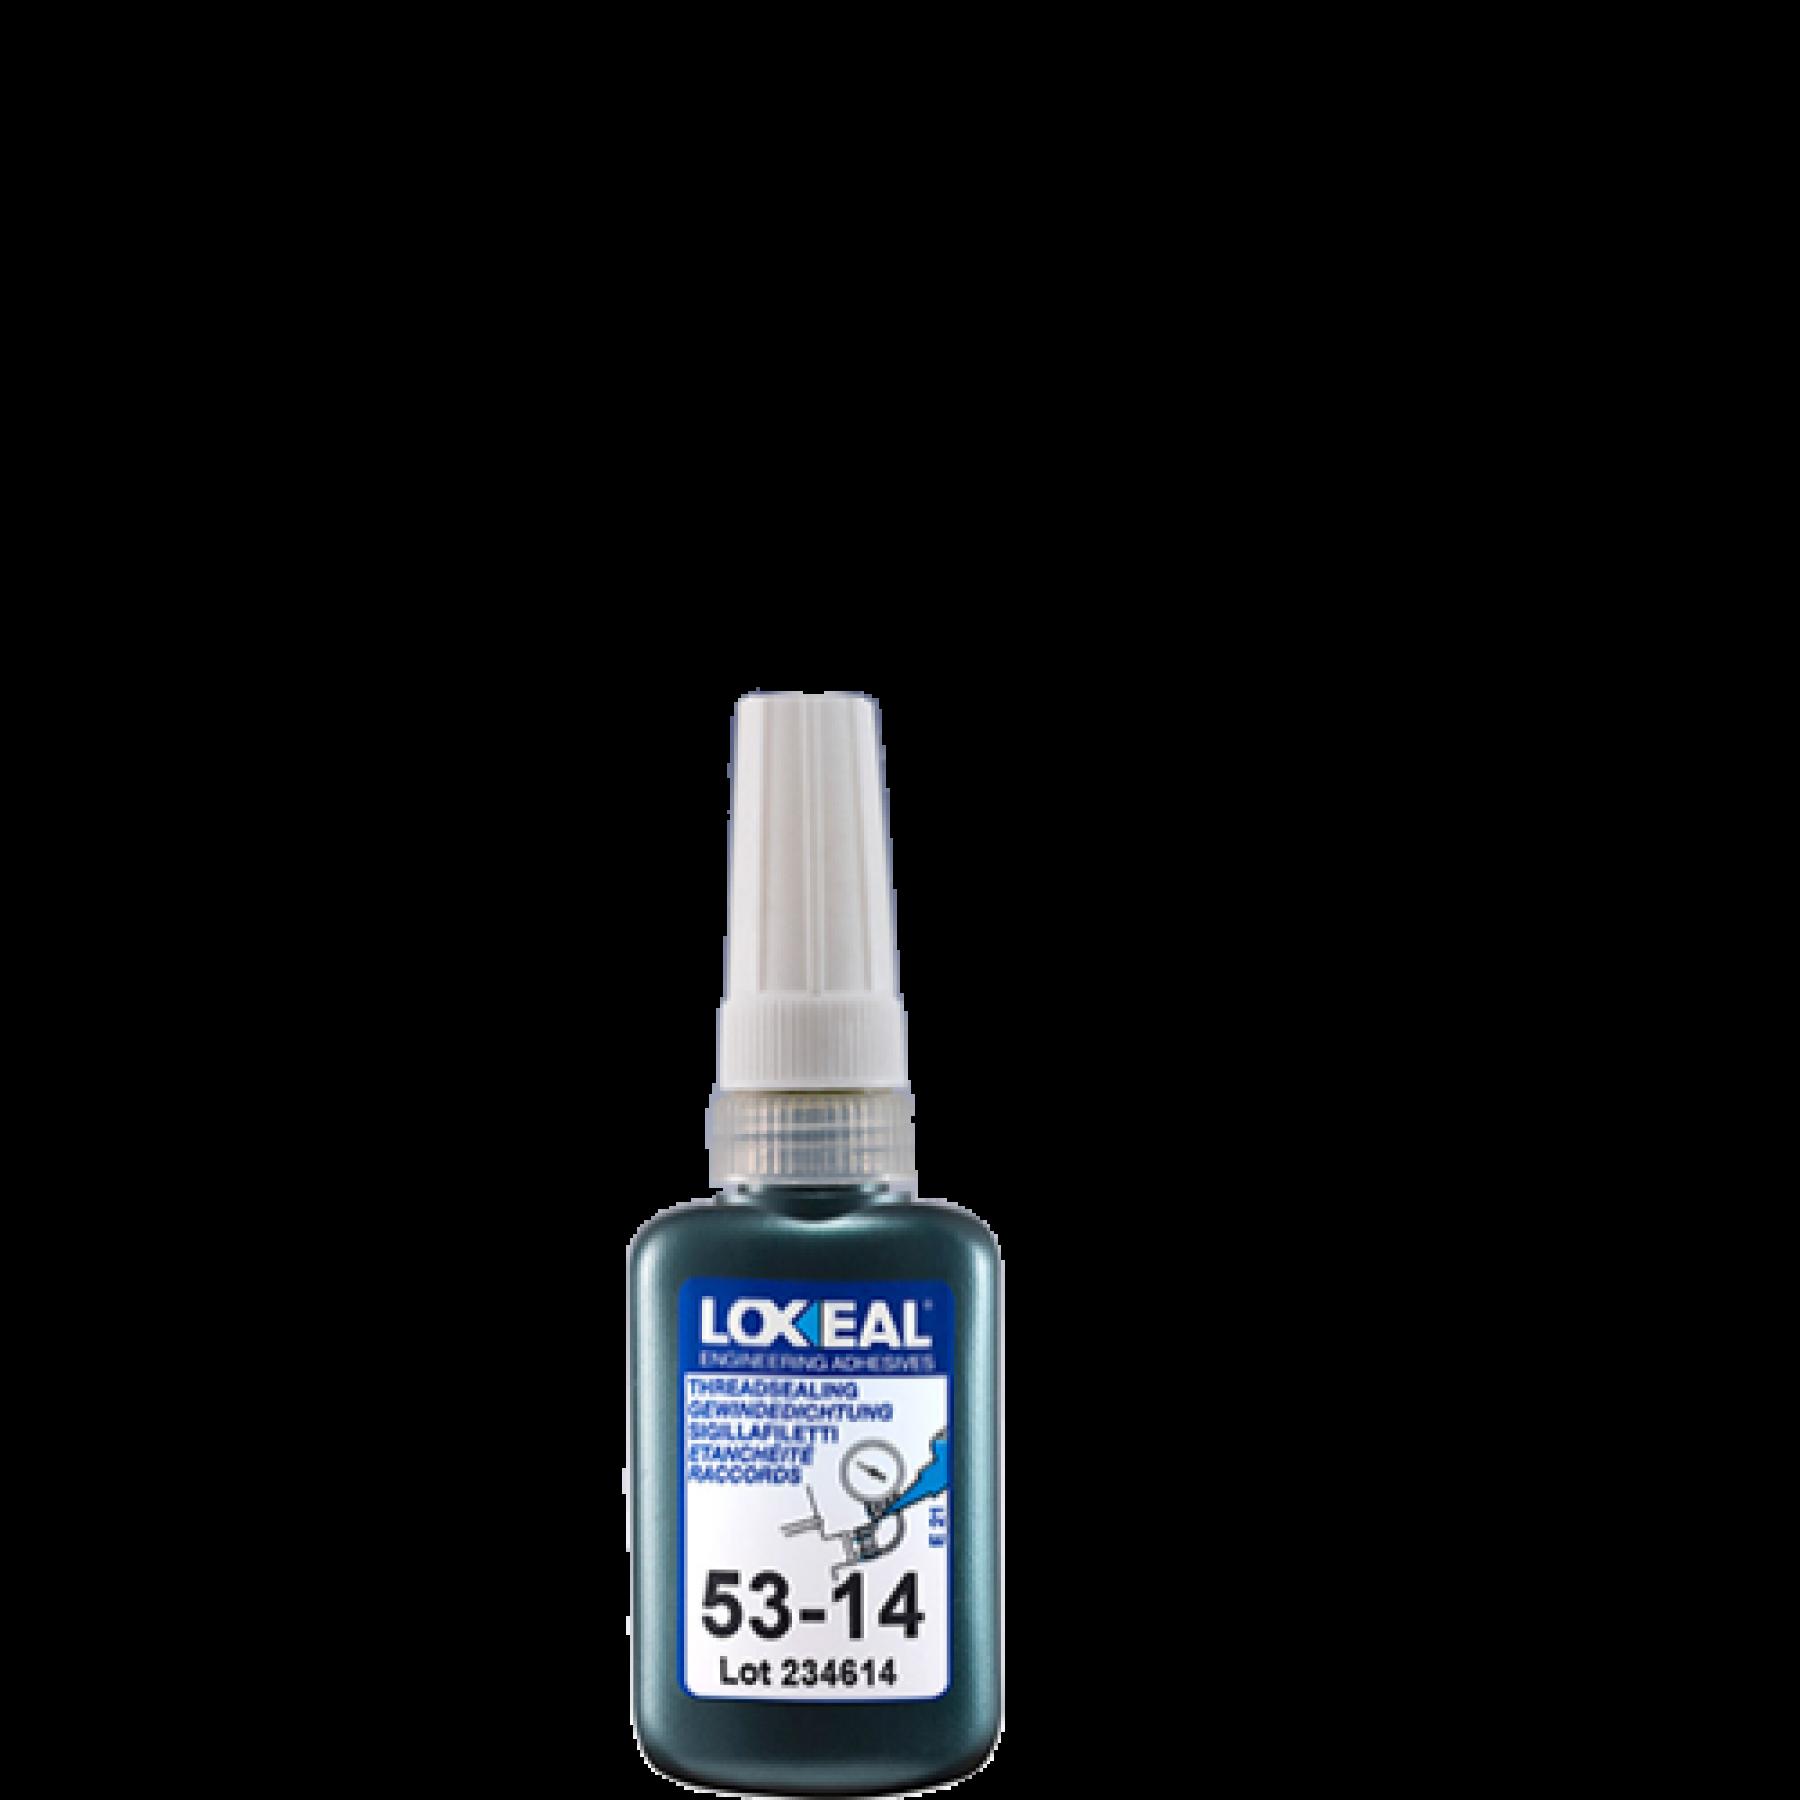 Loxeal 53.14 10ml Schroefdraadafdichting (pneum+hydrau.) 542